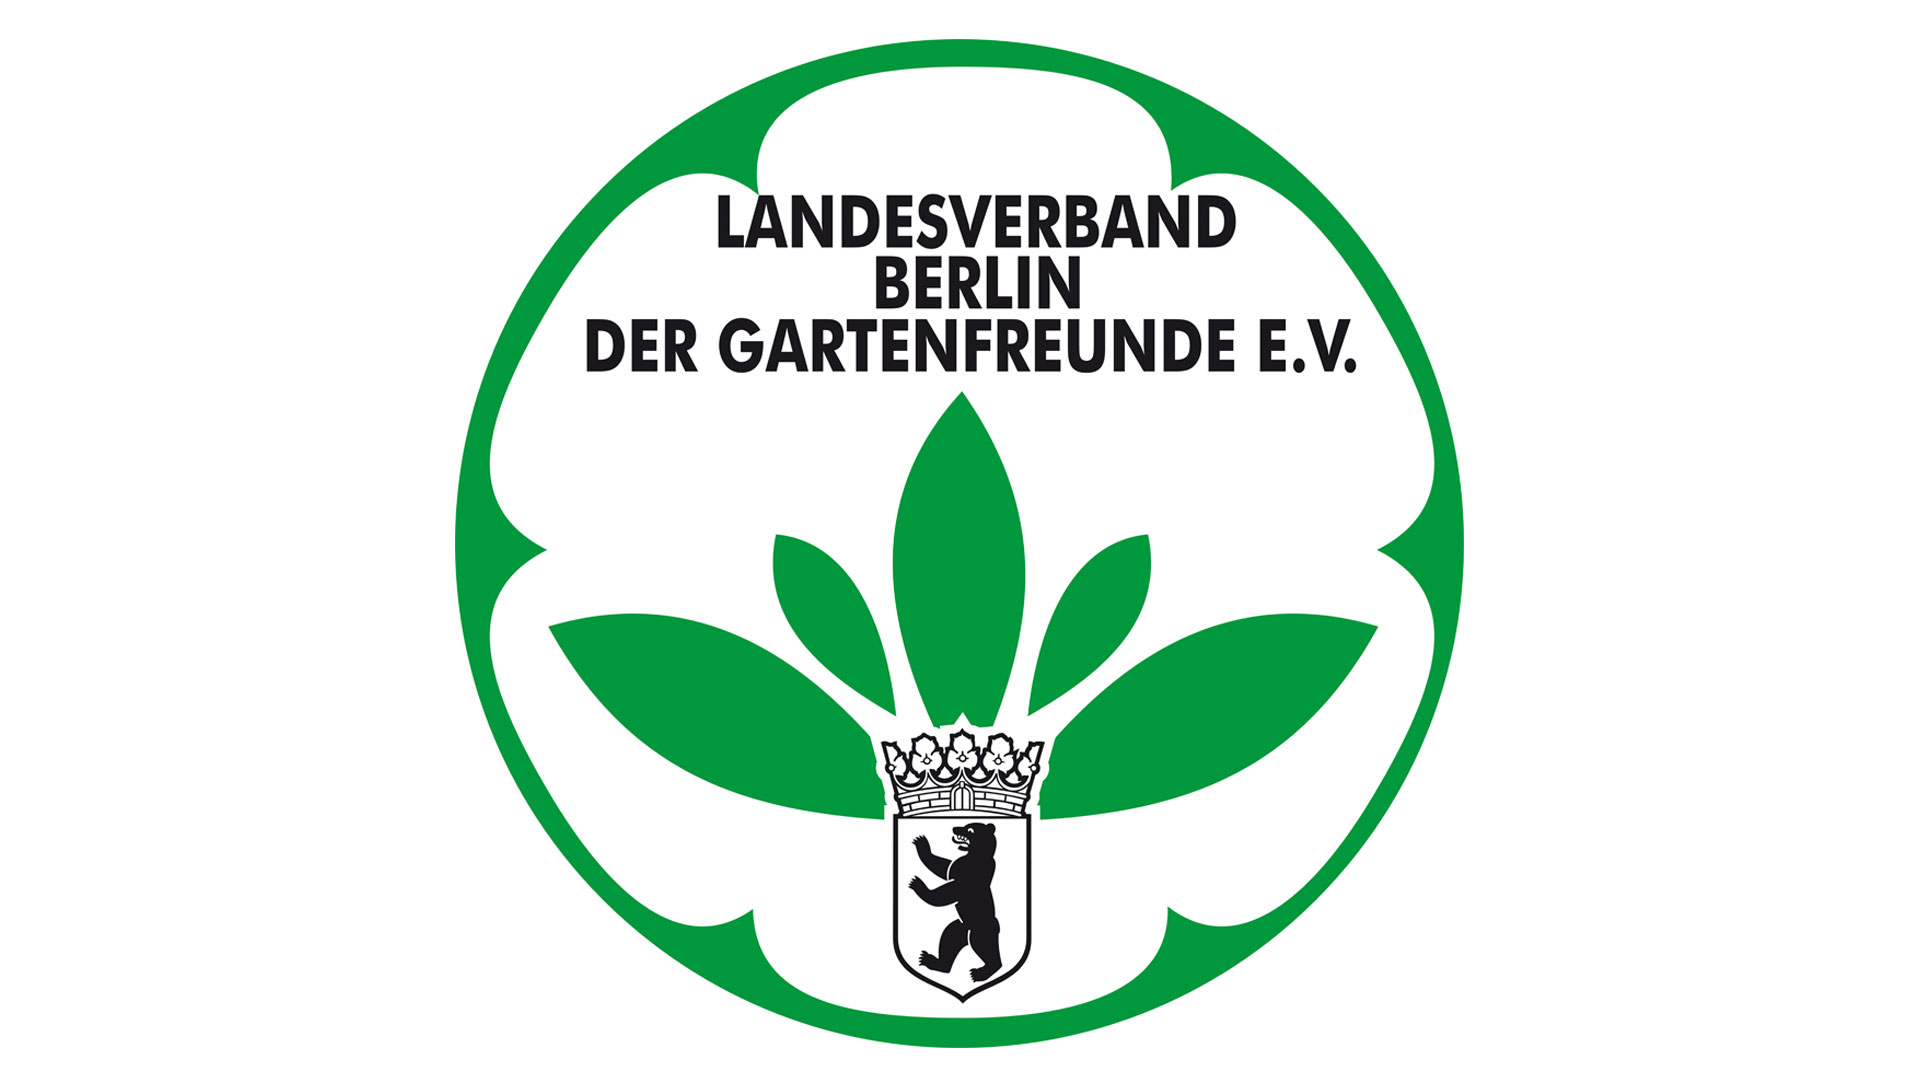 Landesverband Berlin der Gartenfreunde